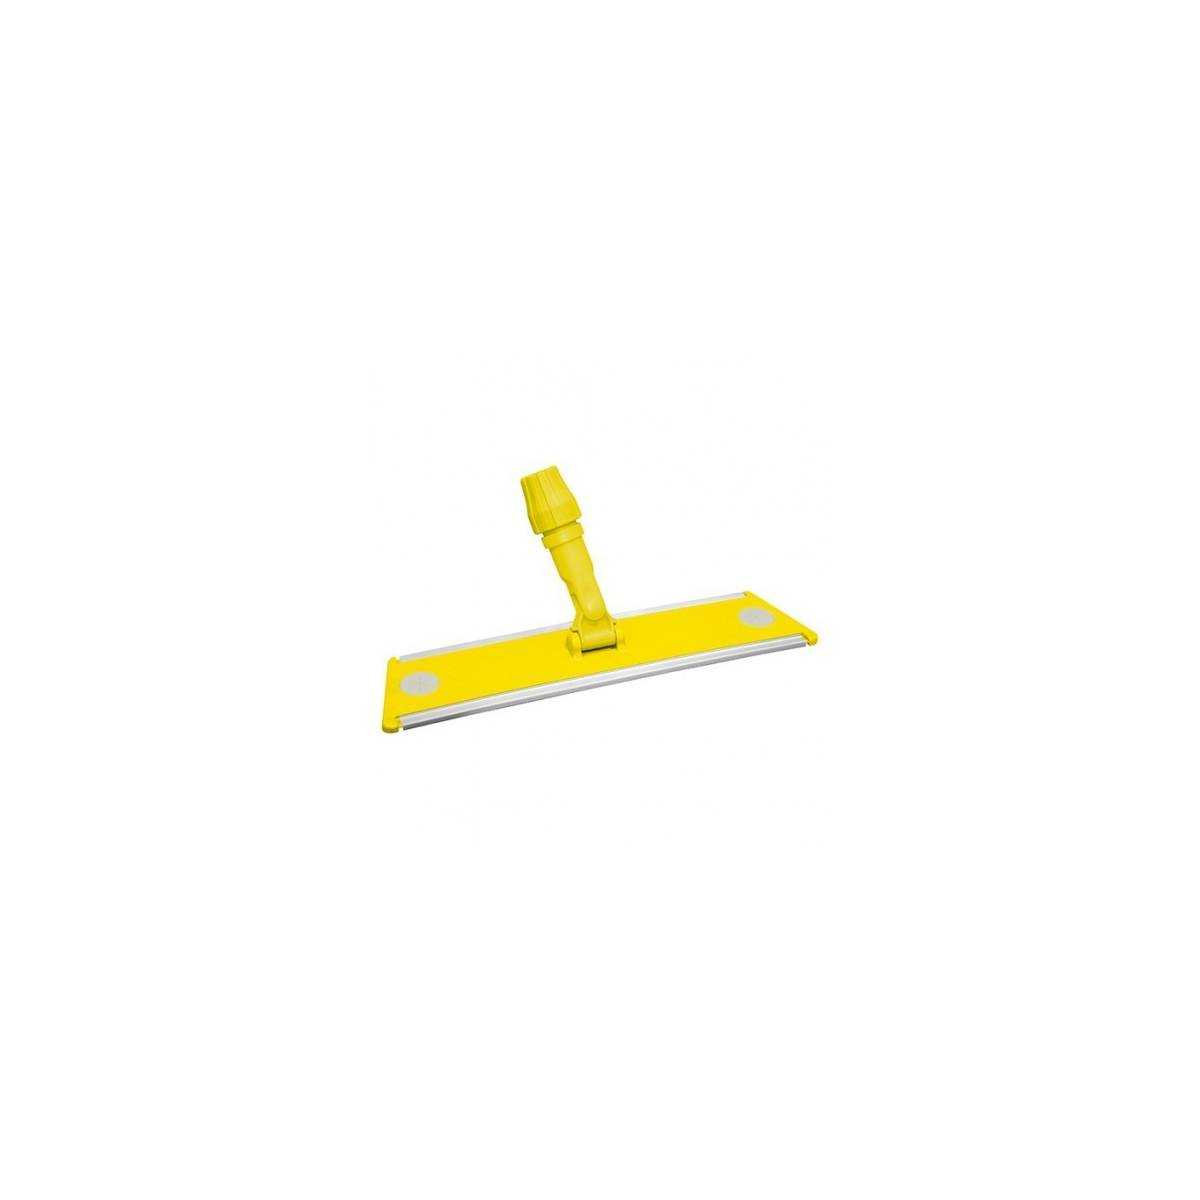 Основа Velcro 40см (Цвет желтый) 0G000887 TTS